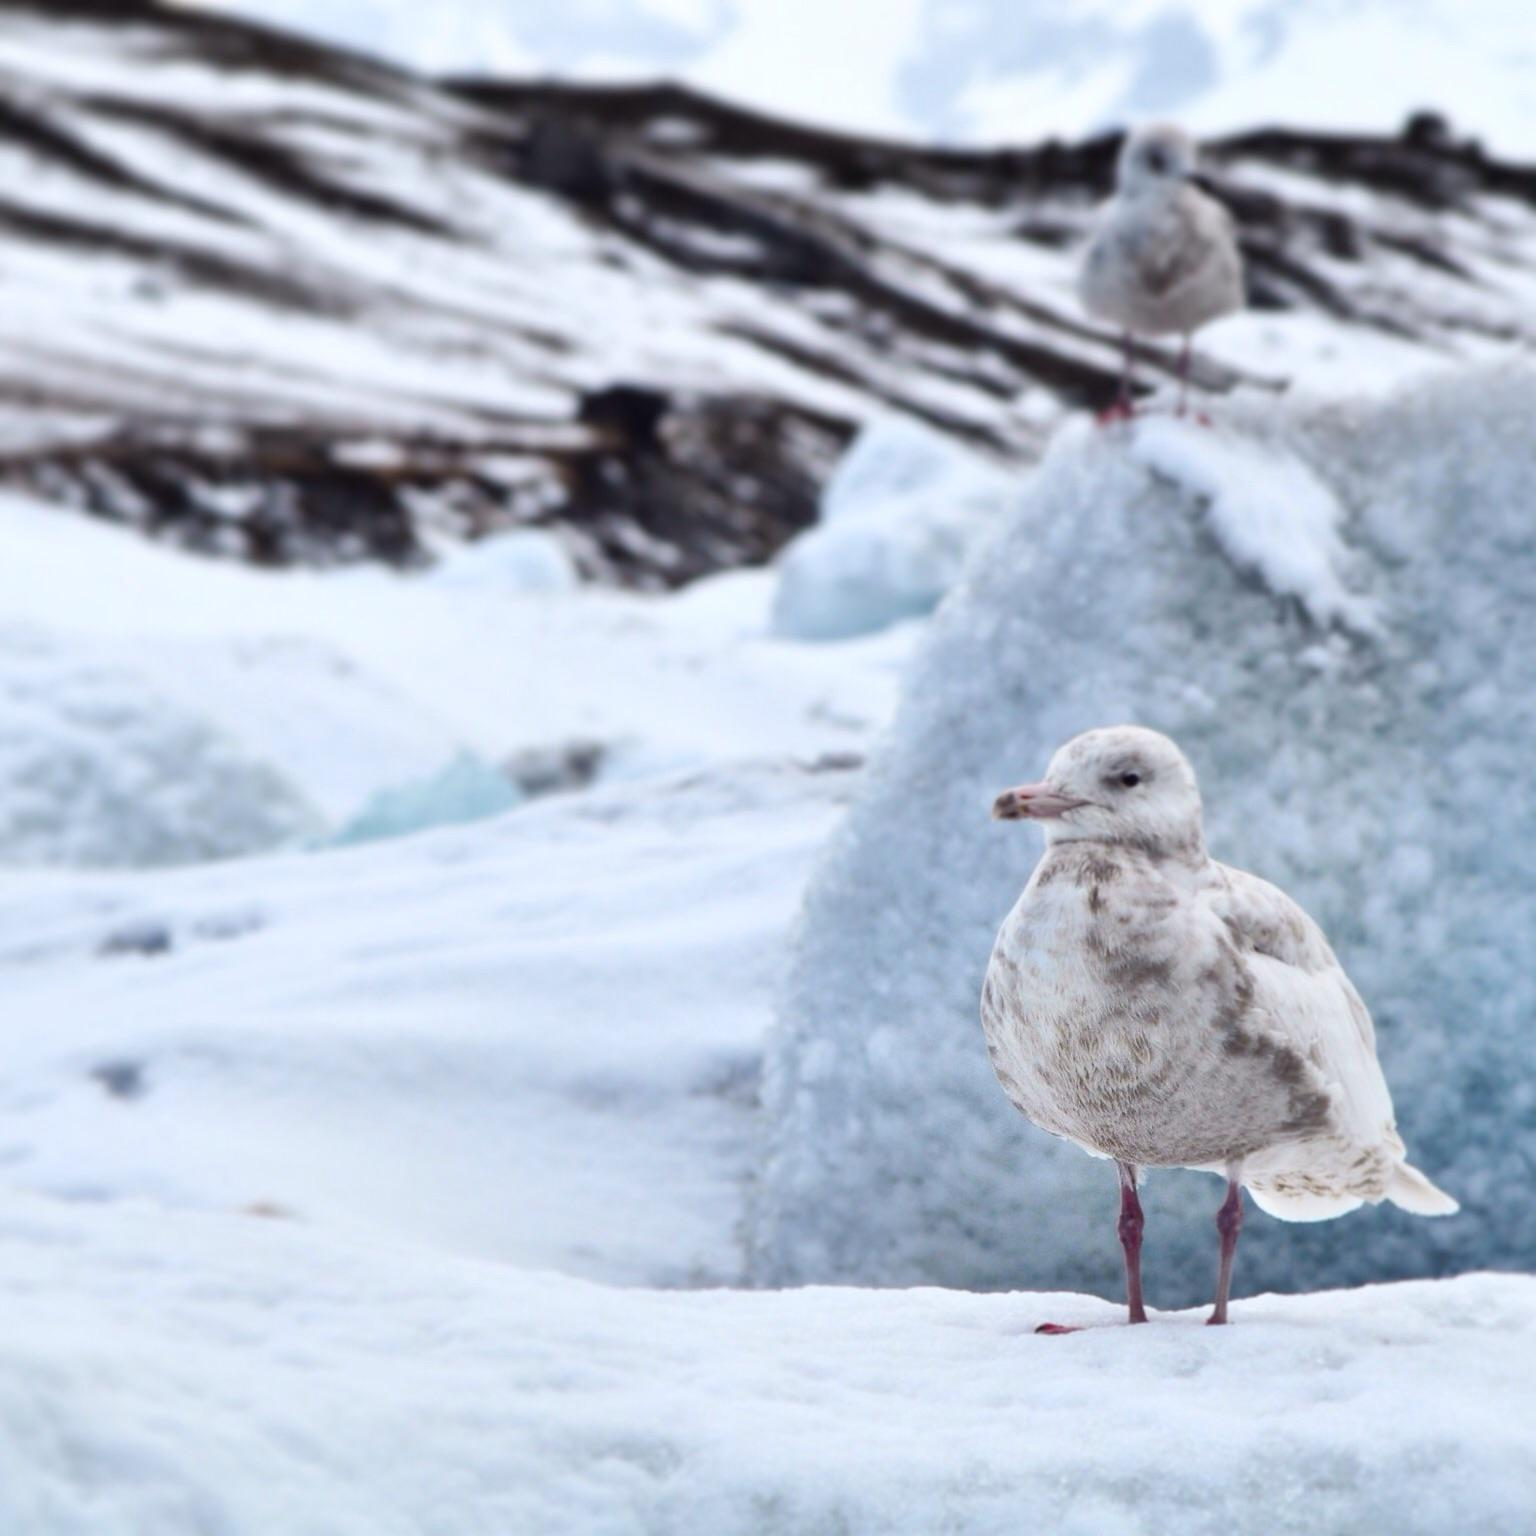 Glaucous Gull Photo by Simon Bernard